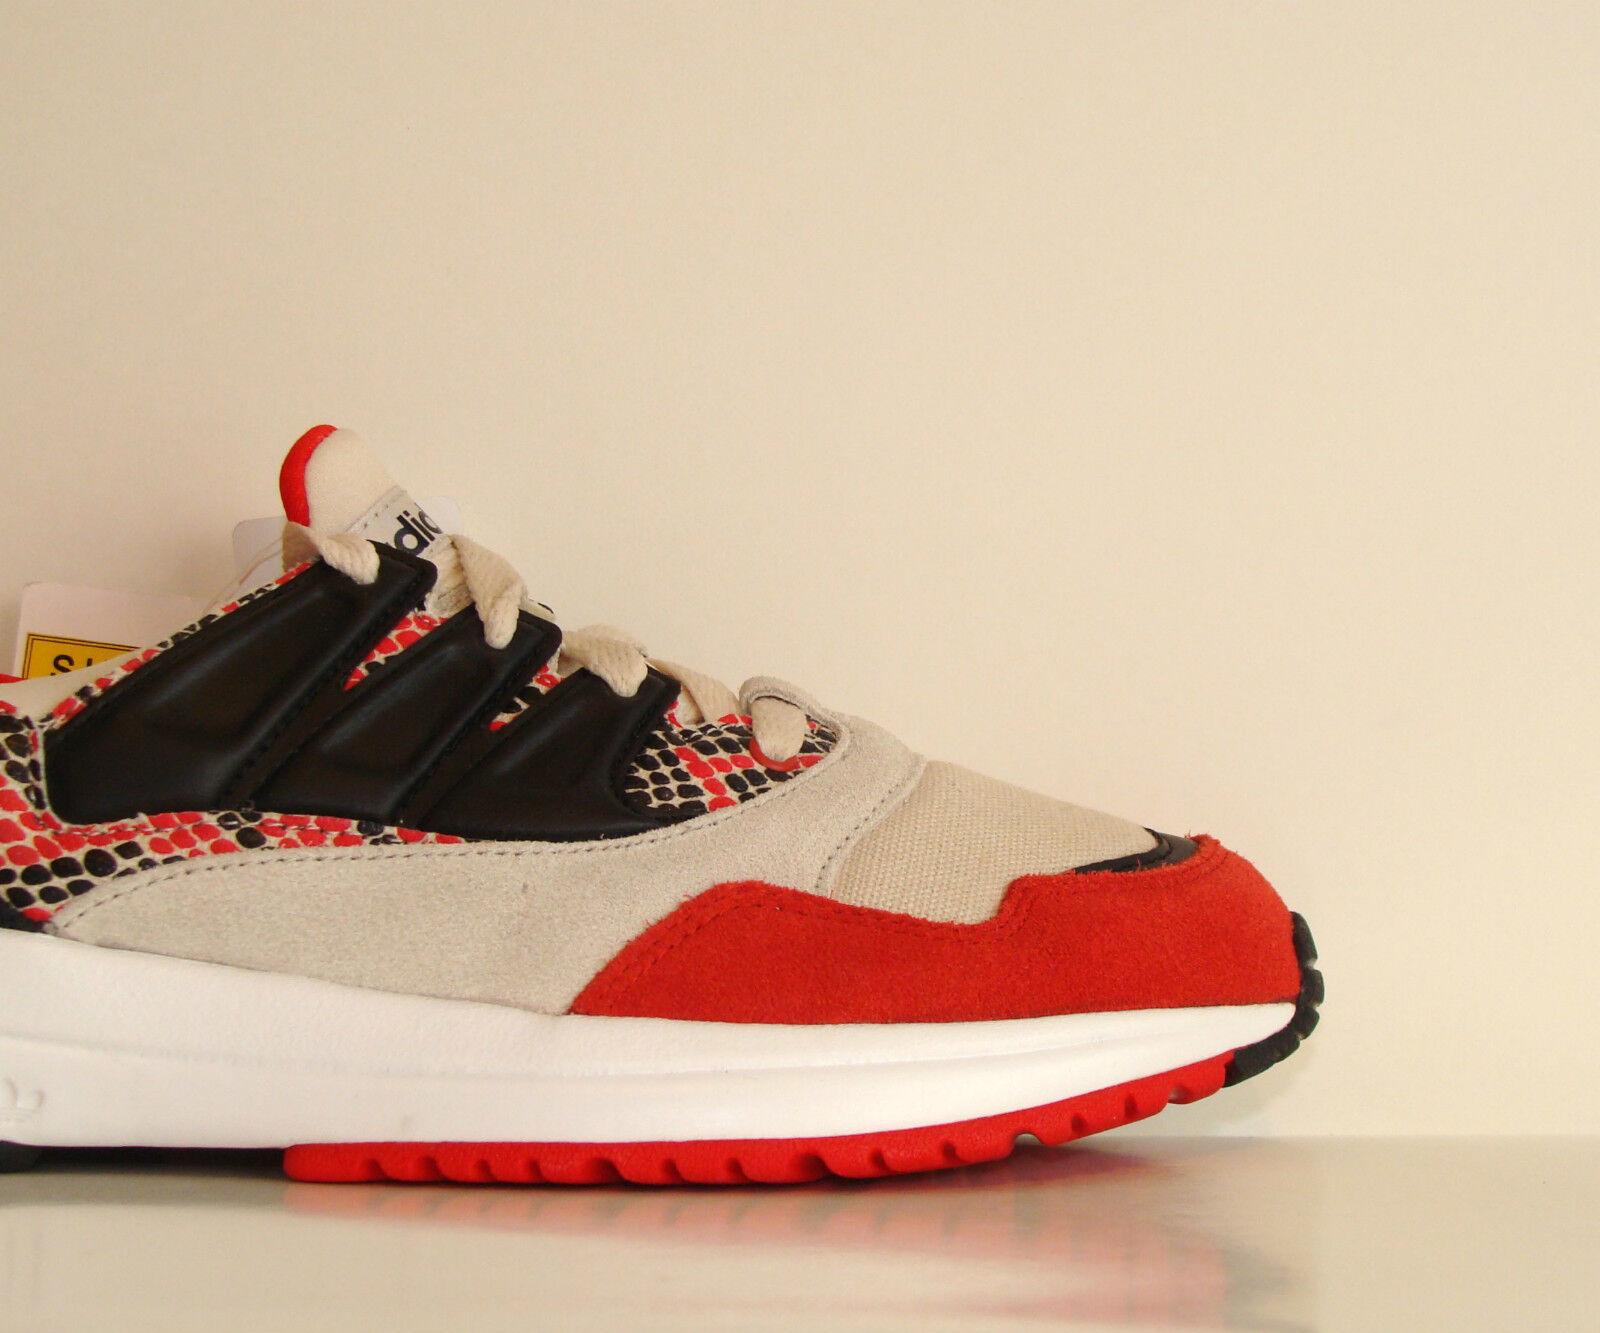 2013 Adidas Originals Allegra EF W Snakeskin SAMPLE 7 Atmos Red Running Trainer best-selling model of the brand